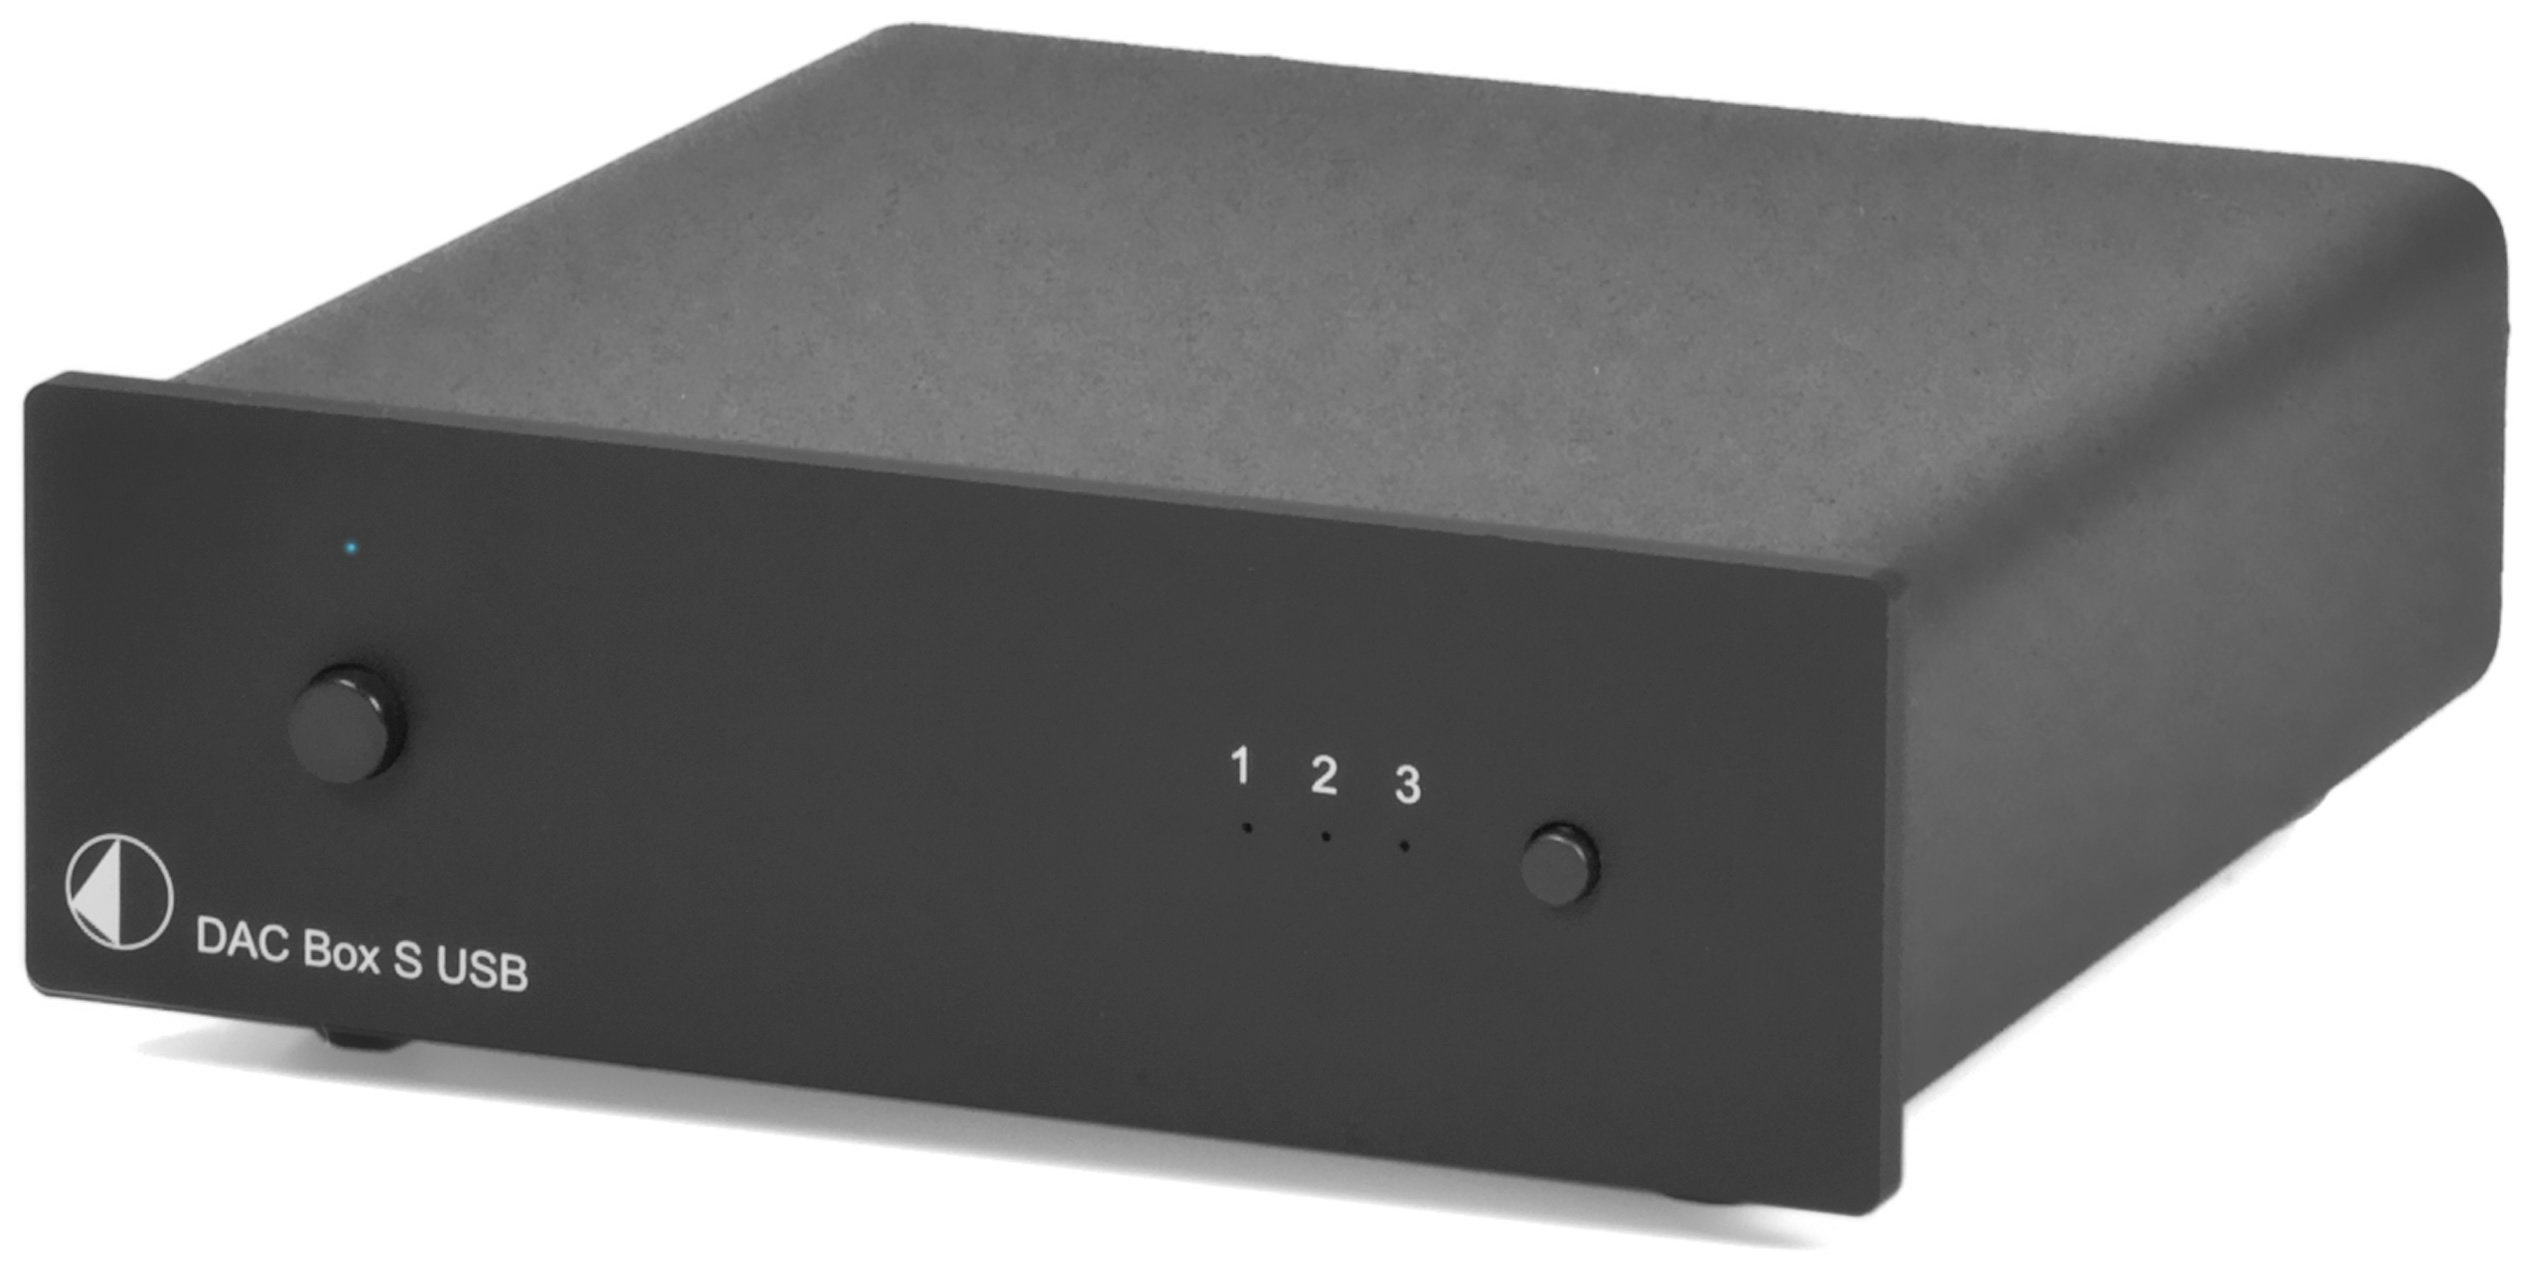 Pro-Ject DAC Box S USB (black) Digital To Analog Converter, Black